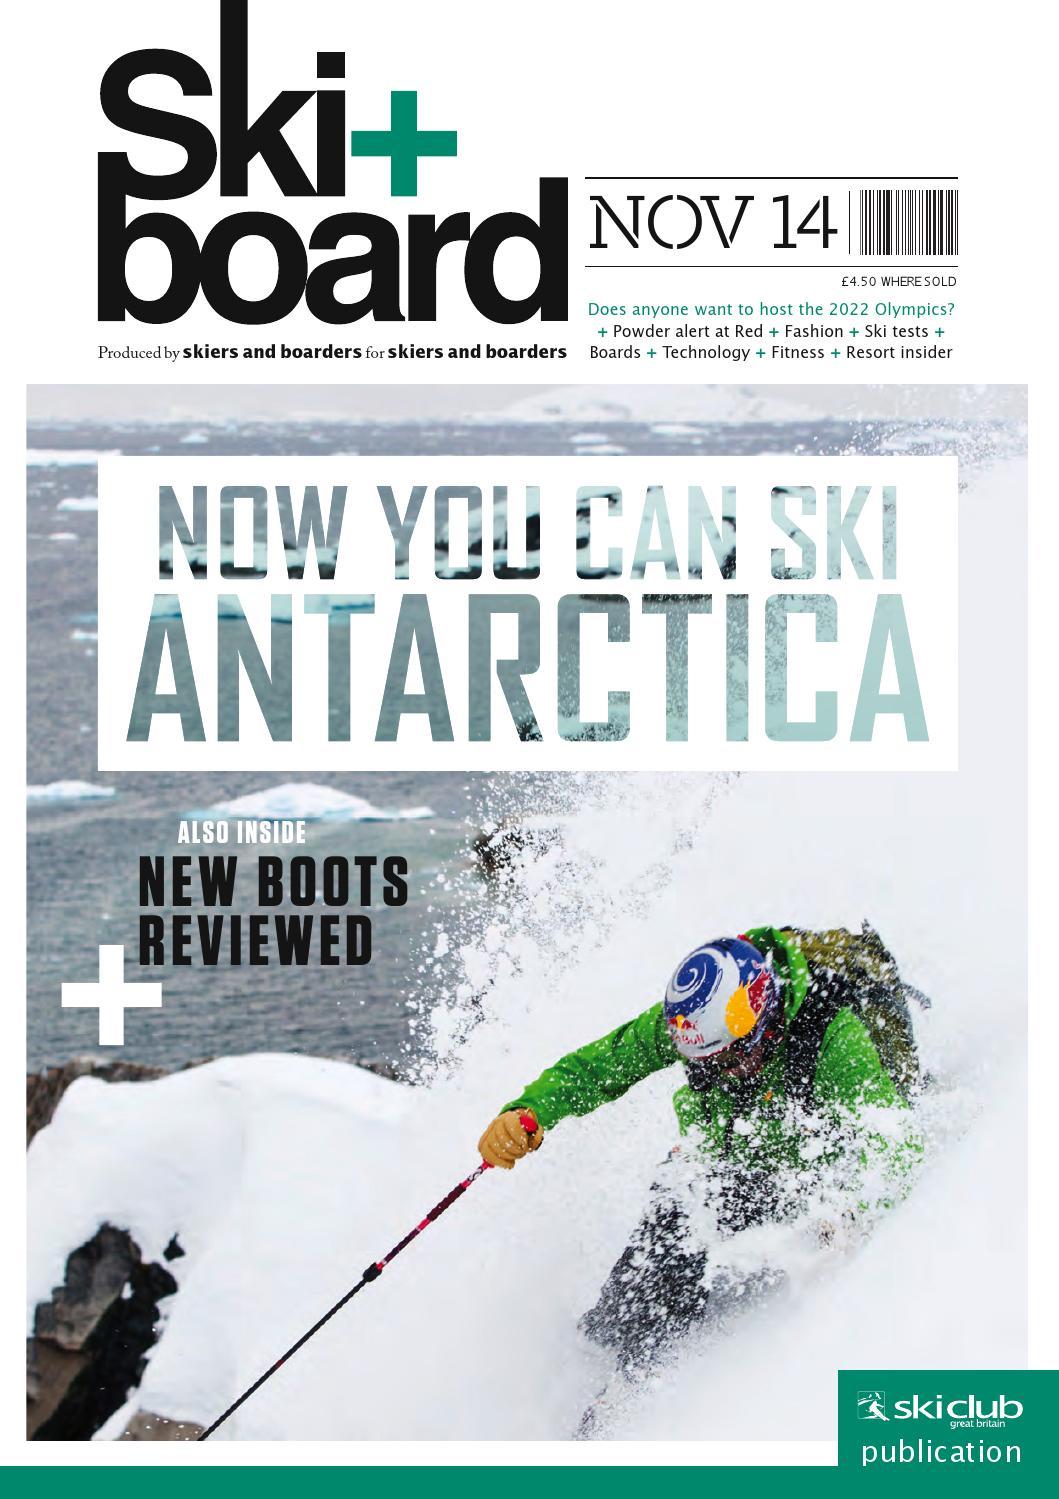 Ski Board November 2014 By Club Of Great Britain Issuu Jfashion Womenamp039s Parka Jacket Simpel Elegan Gabriella